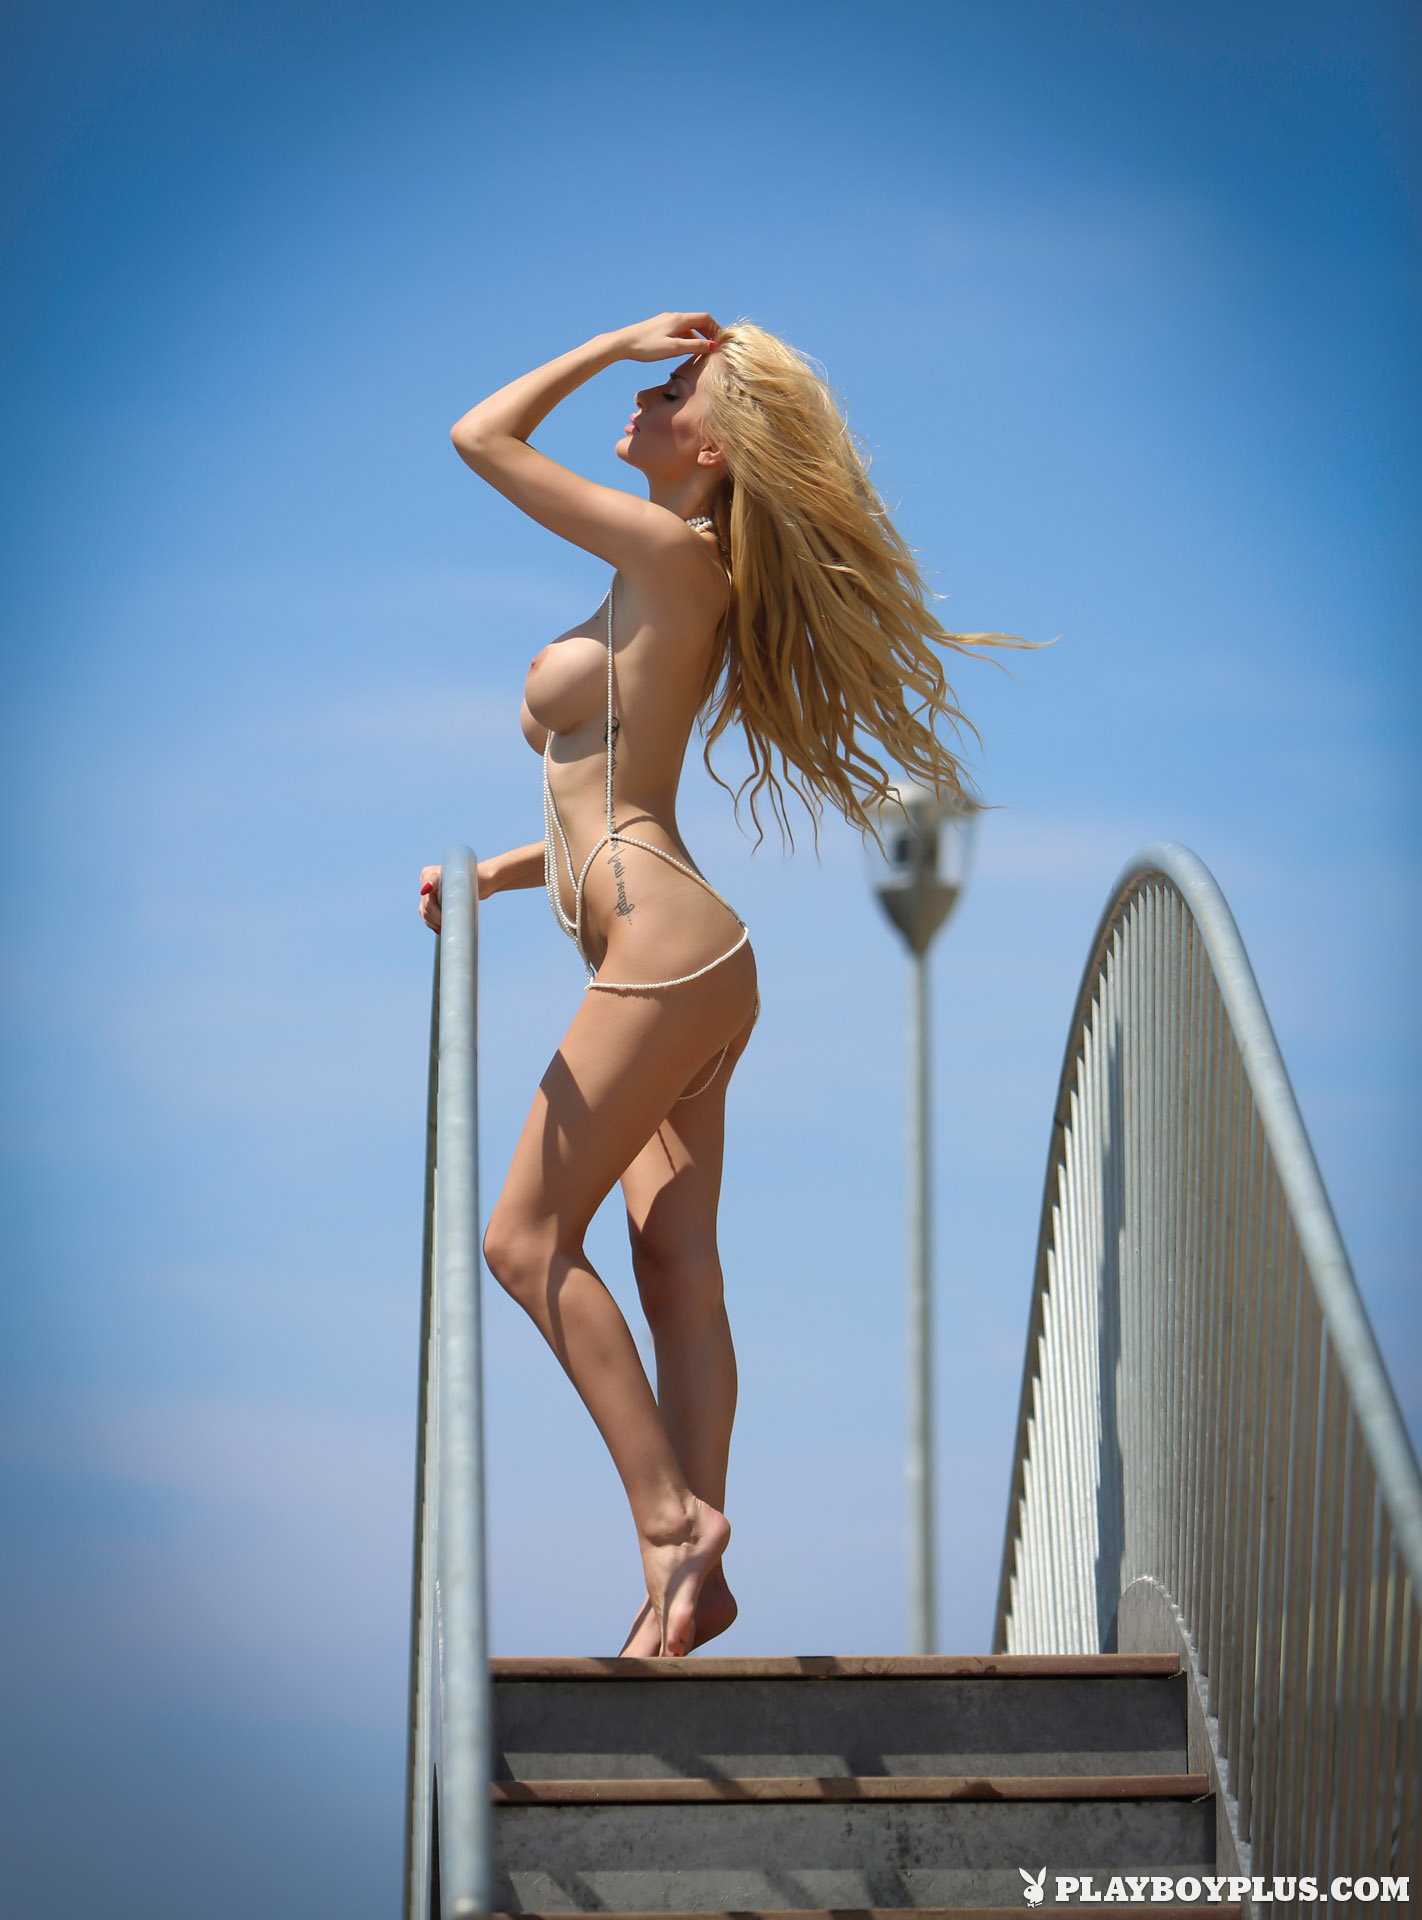 bozana-vujinovic-nude-boobs-blonde-croatia-playboy-09